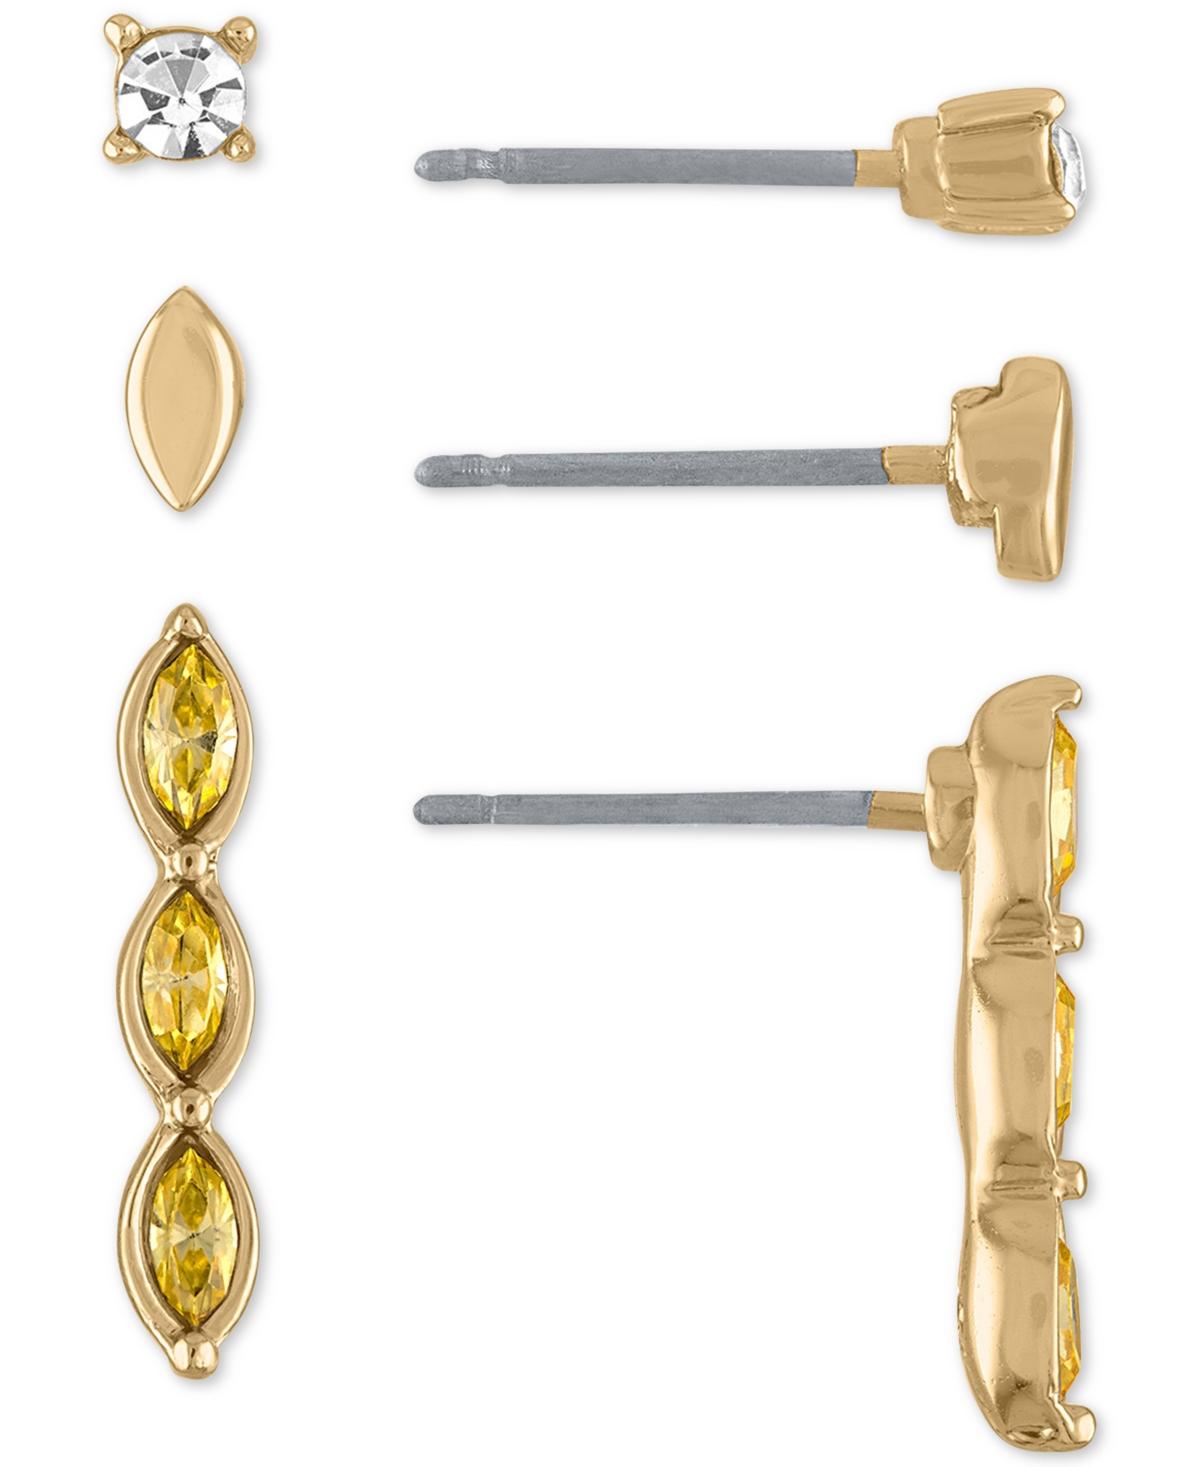 Rachel Rachel Roy Gold-Tone 3-Pc. Set Round & Marquise Crystal Earrings